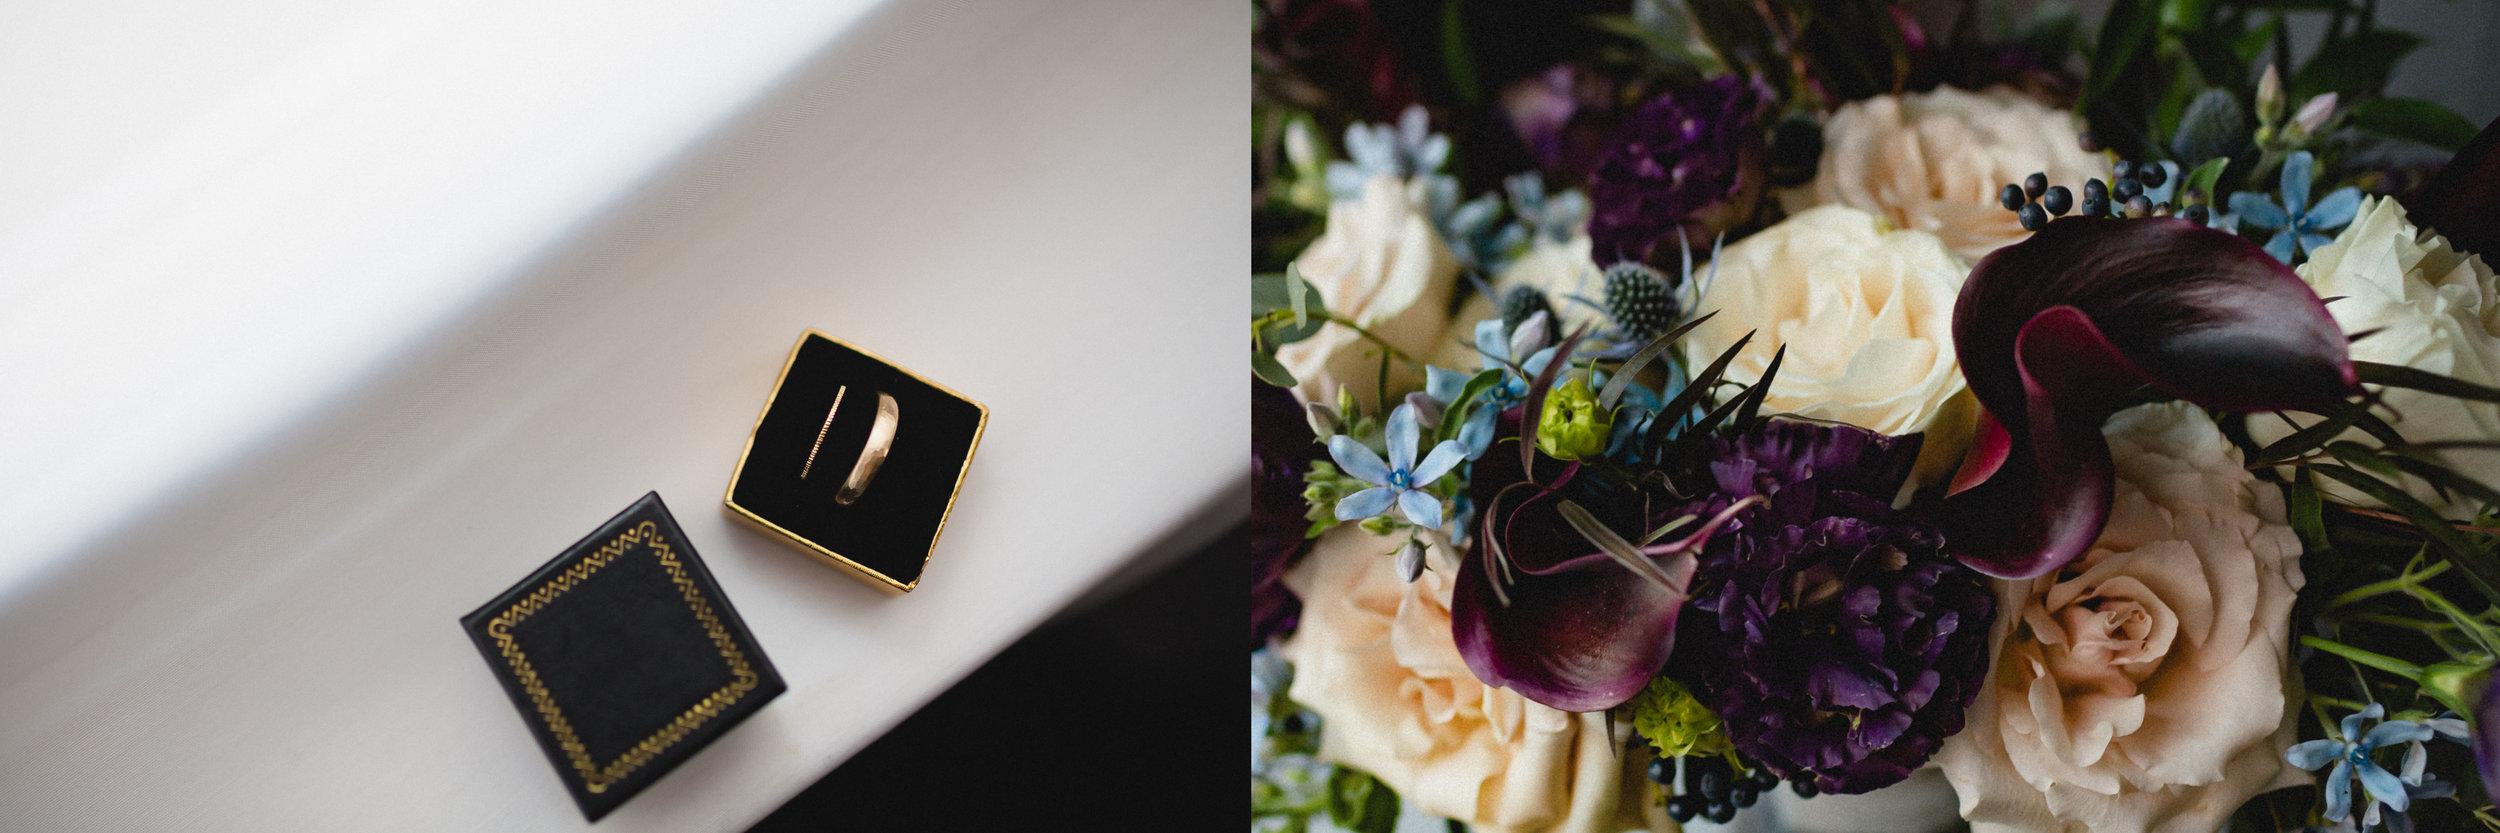 flowers ring .jpg